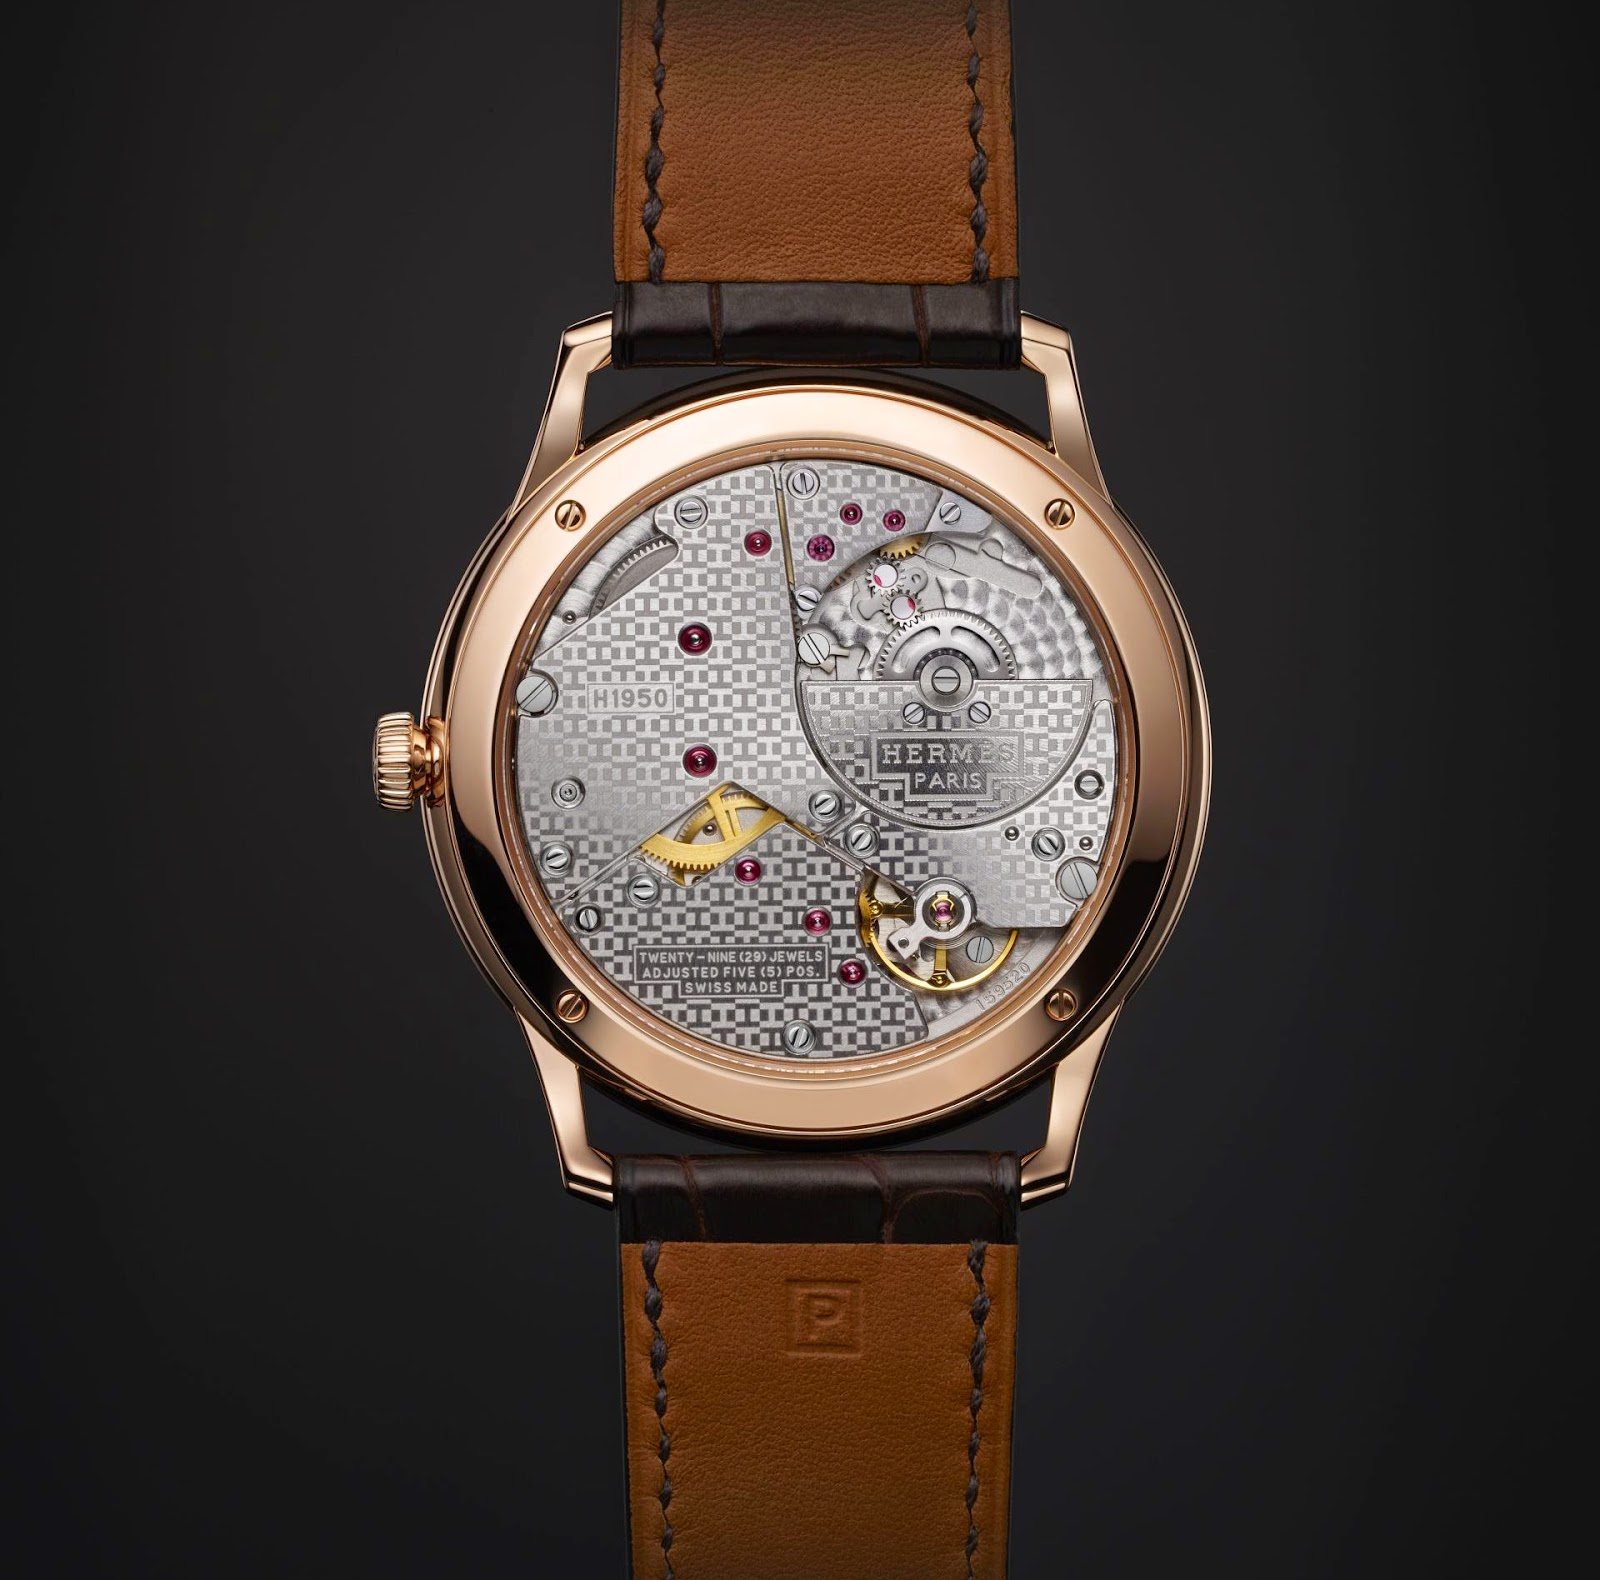 Hermès - Slim d'Hermès Petite Seconds Automatic watch case back view micro-rotor movement